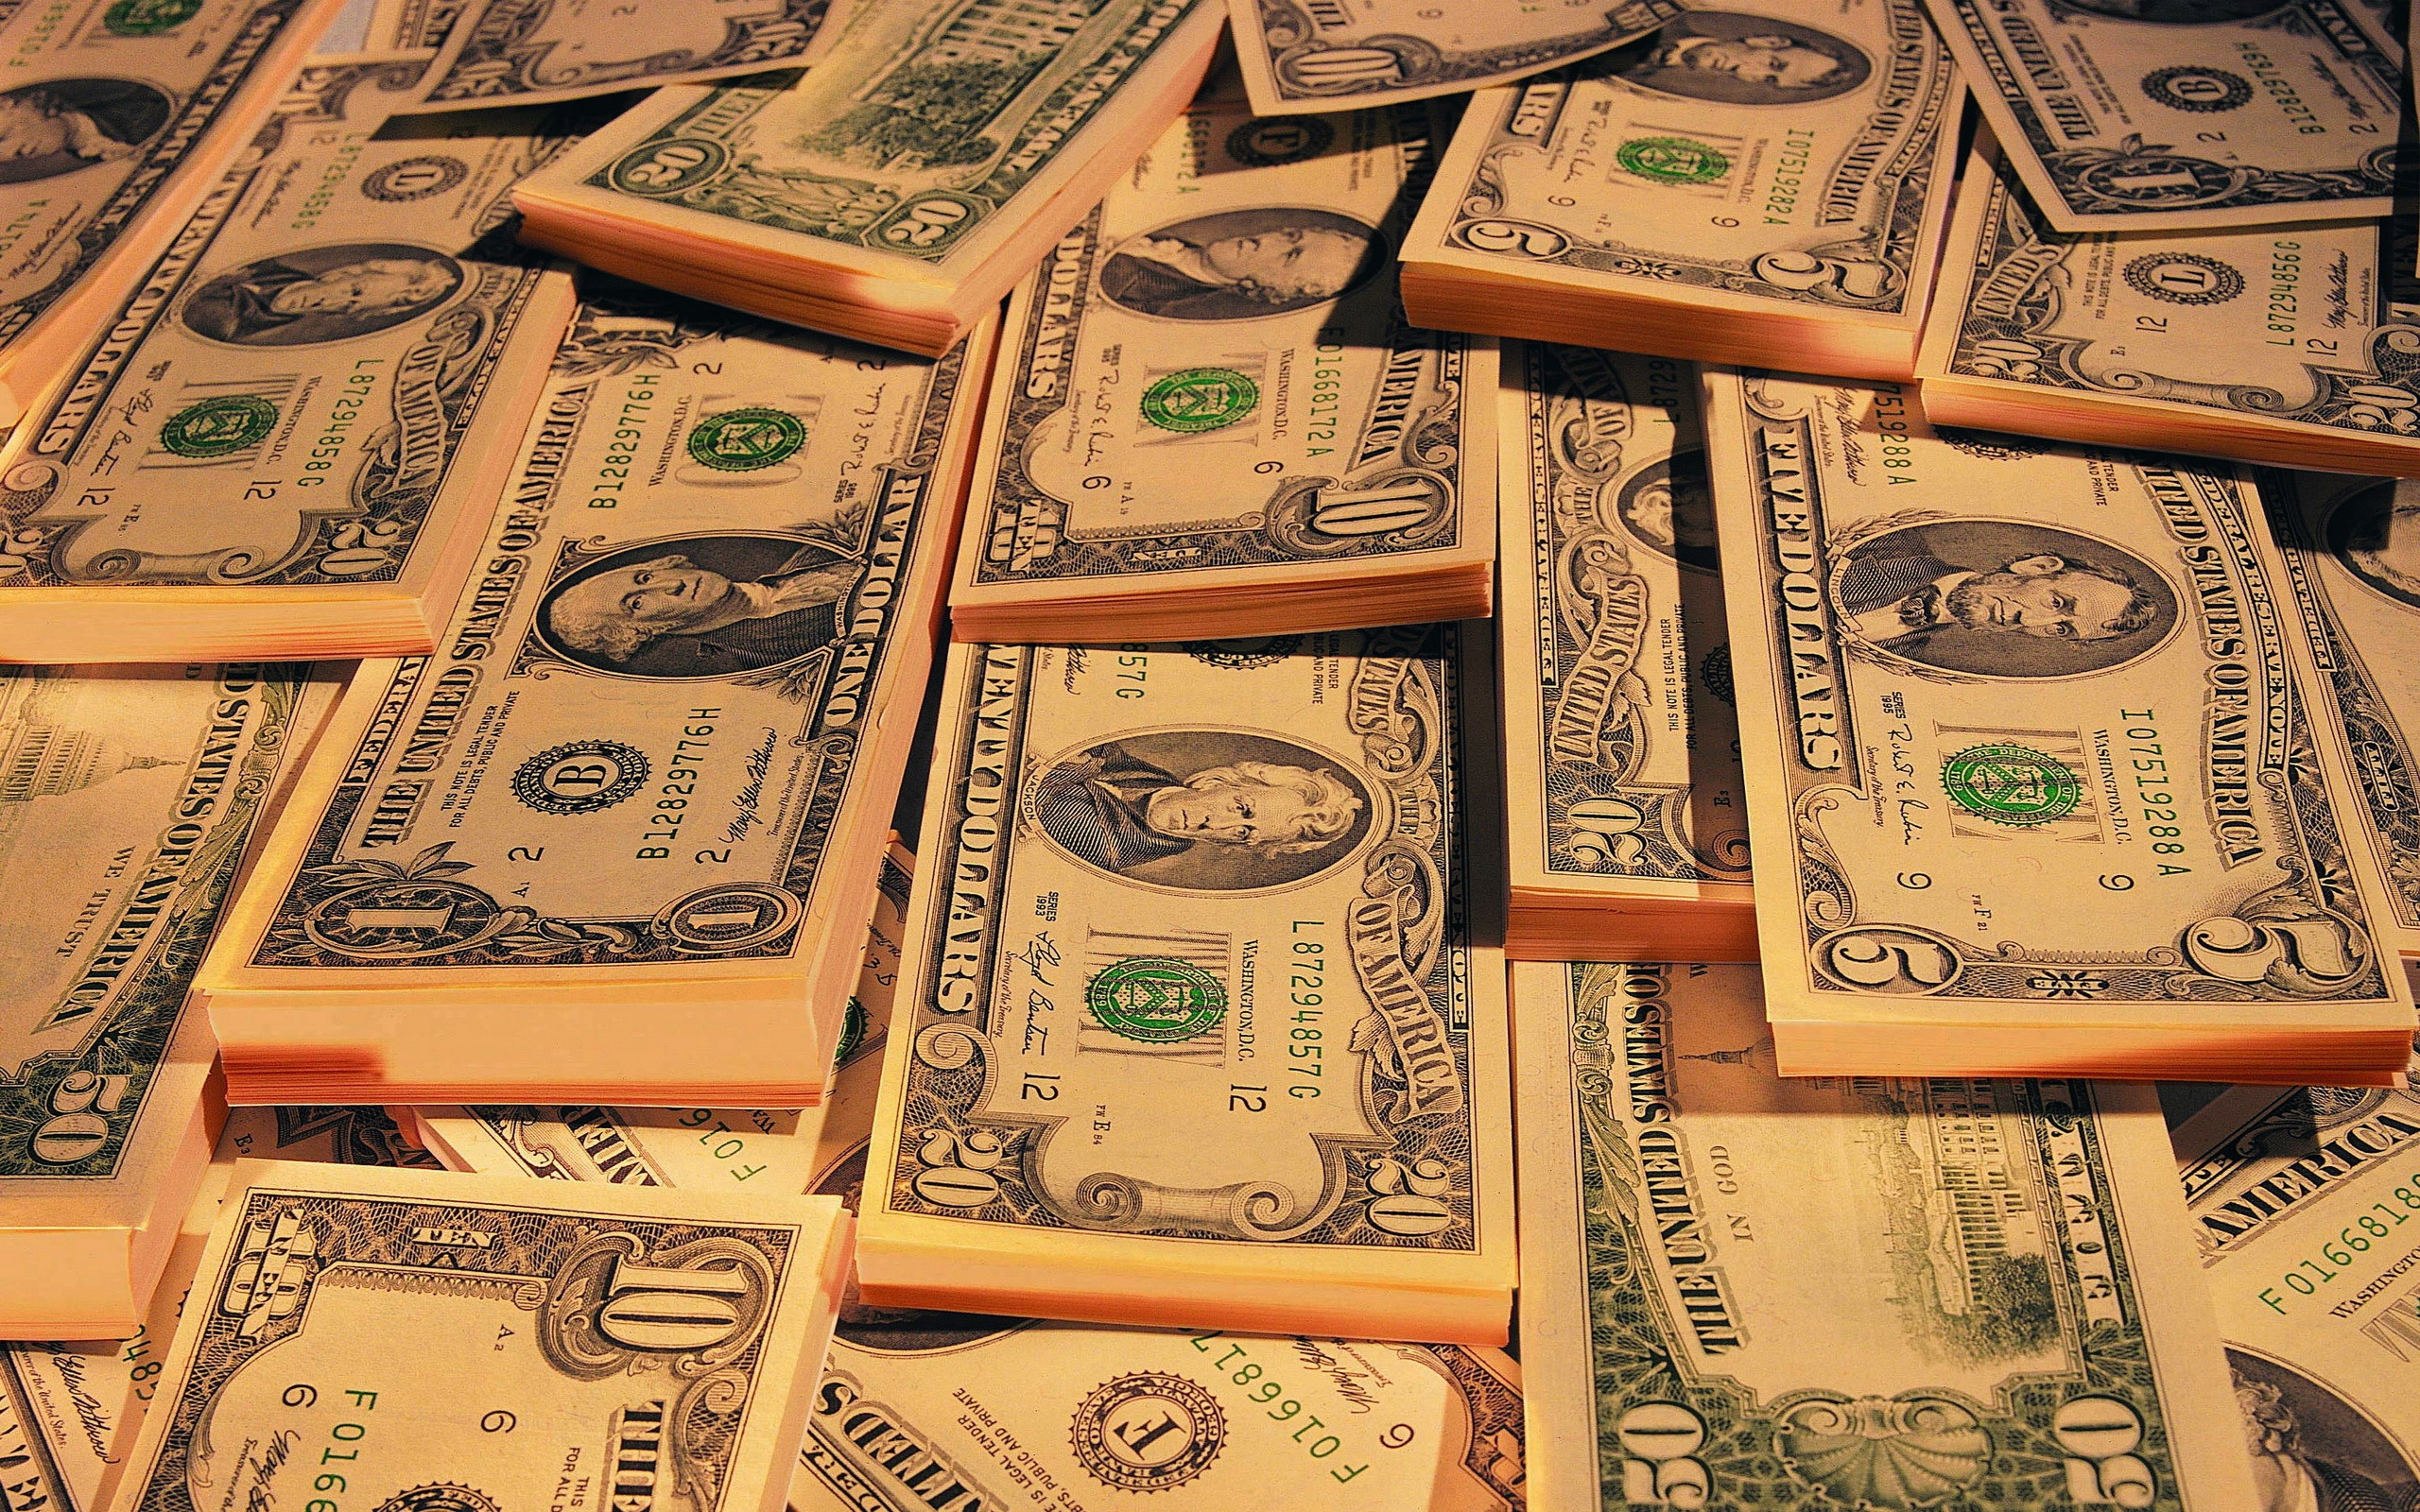 доллары, банкноты, купюры